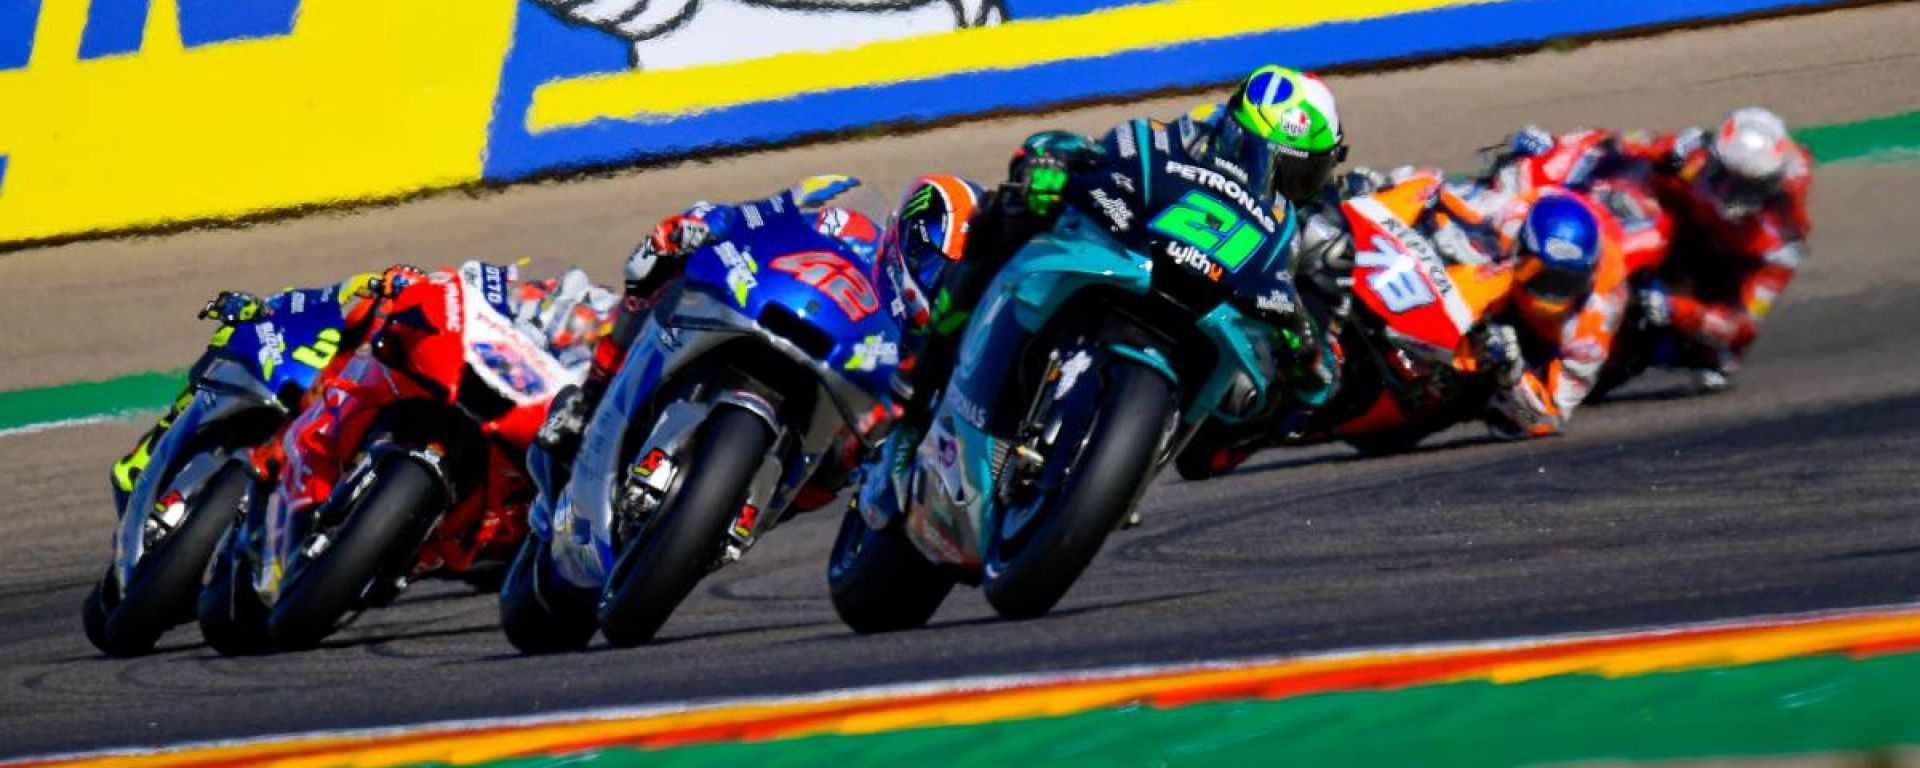 Franco Morbidelli (Yamaha) guida il gruppo ad Aragon